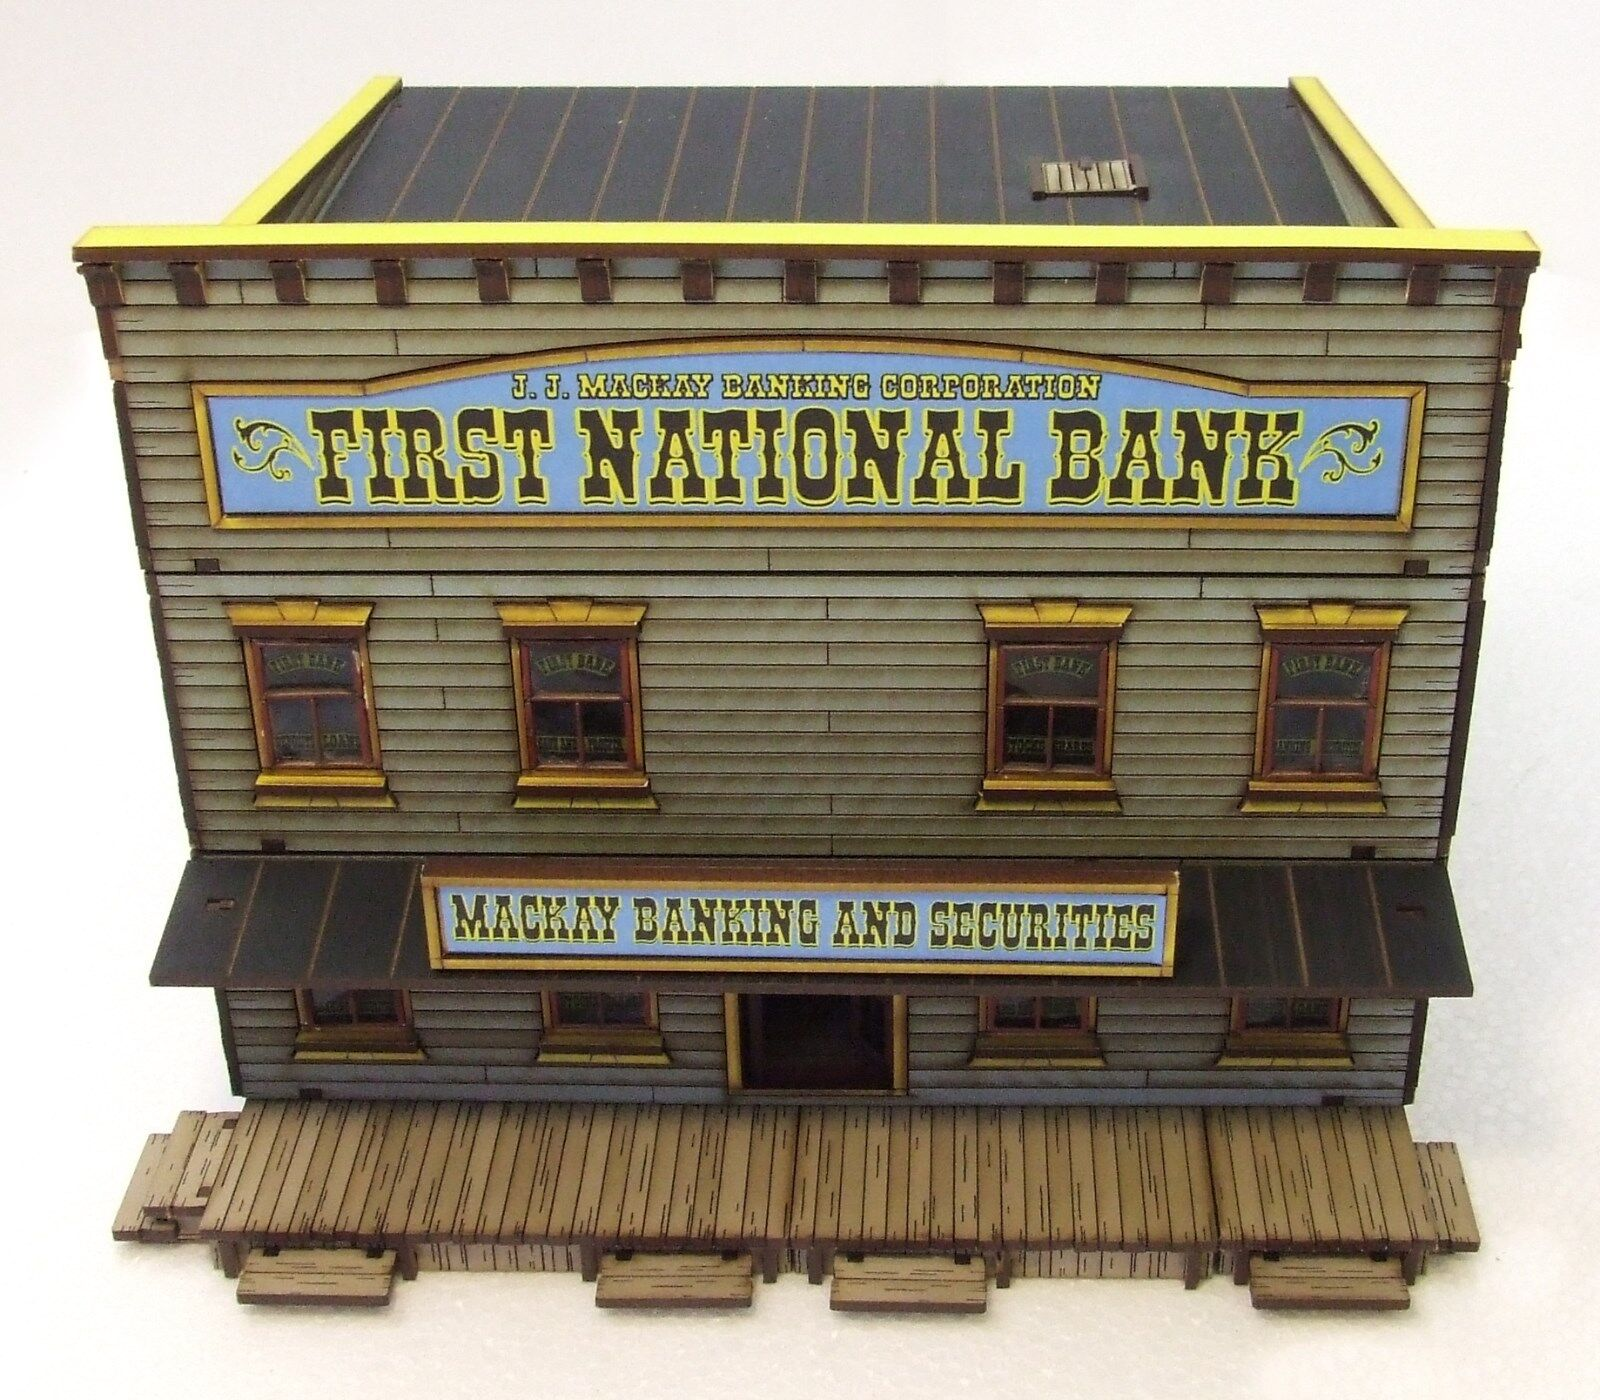 FIRST NATIONAL BANK  - FULLY BUILT BUILT BUILT (as seen)  28mm WILD WEST   ACW  MDF BUILDING 13b19c